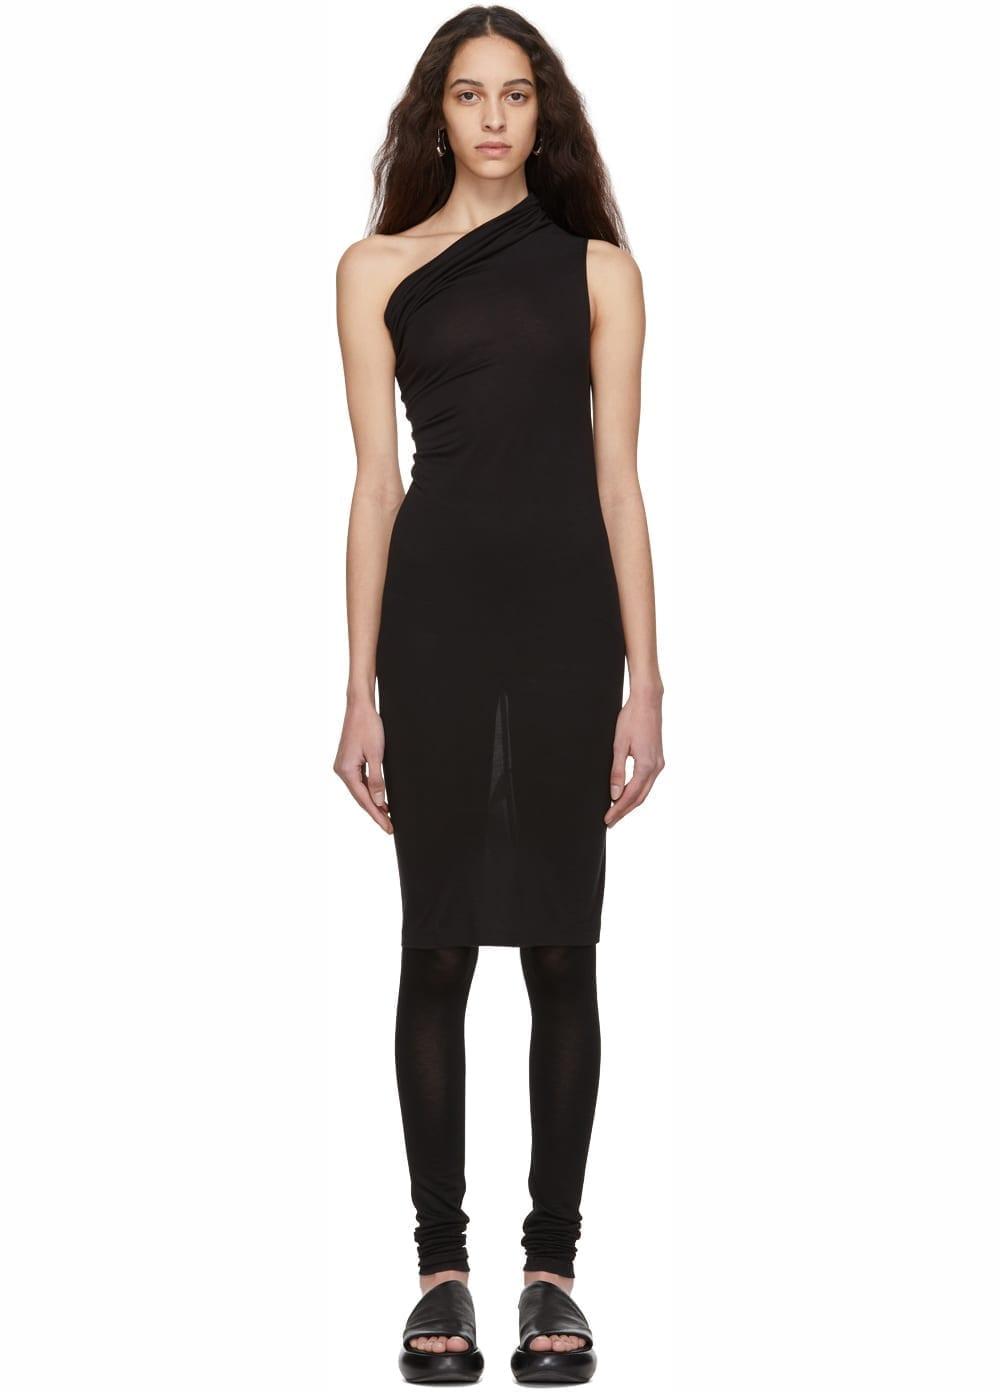 RICK OWENS LILIES Heavy Jersey Single Shoulder Black Dress